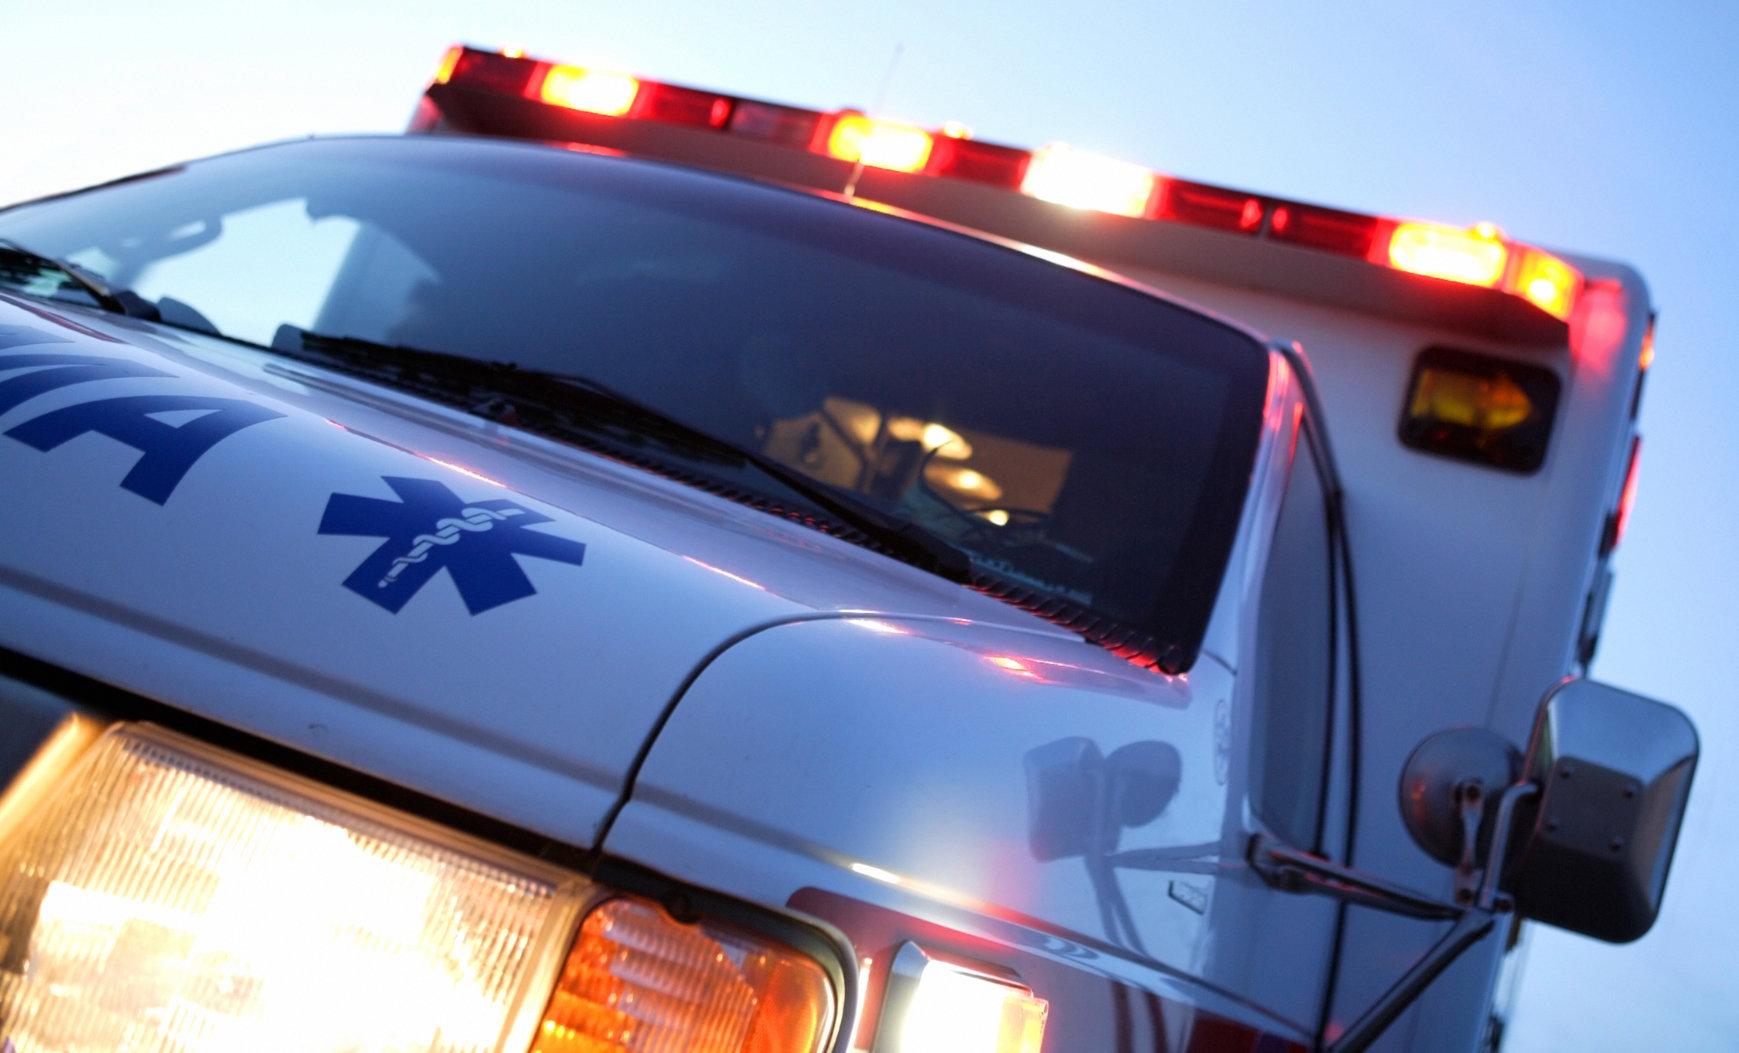 16-year-old boy dies after car crashes, flips in Wayne